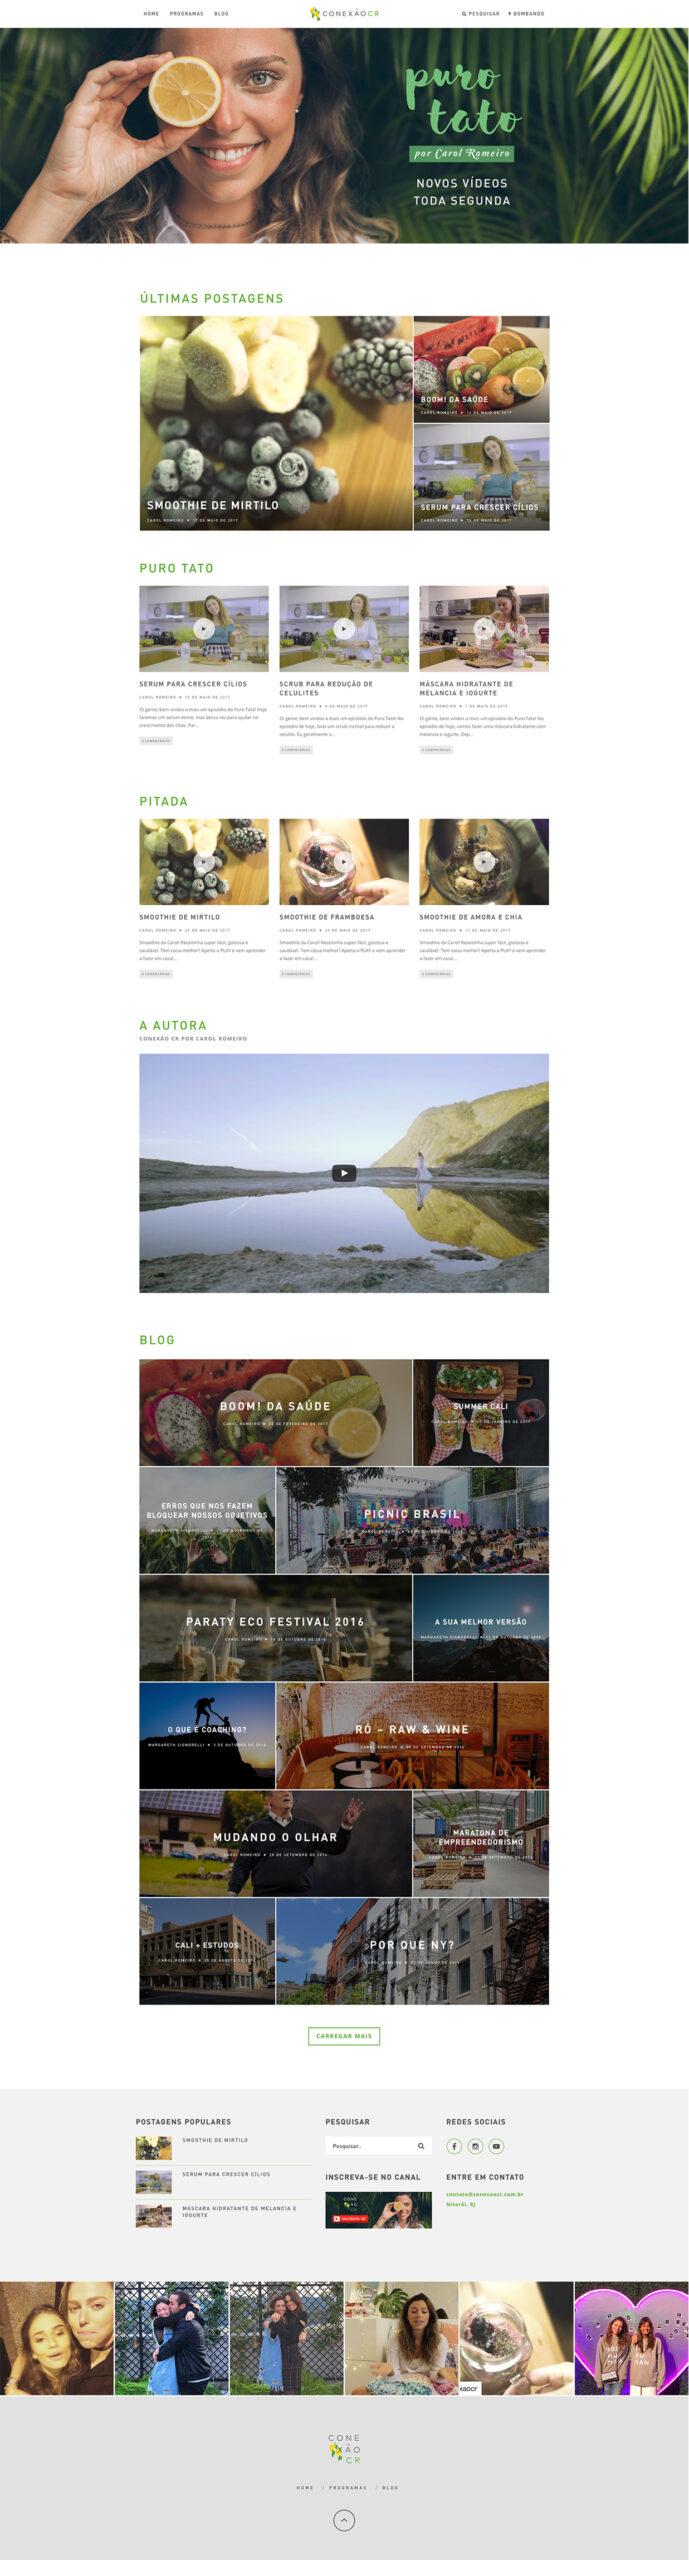 site-scroll